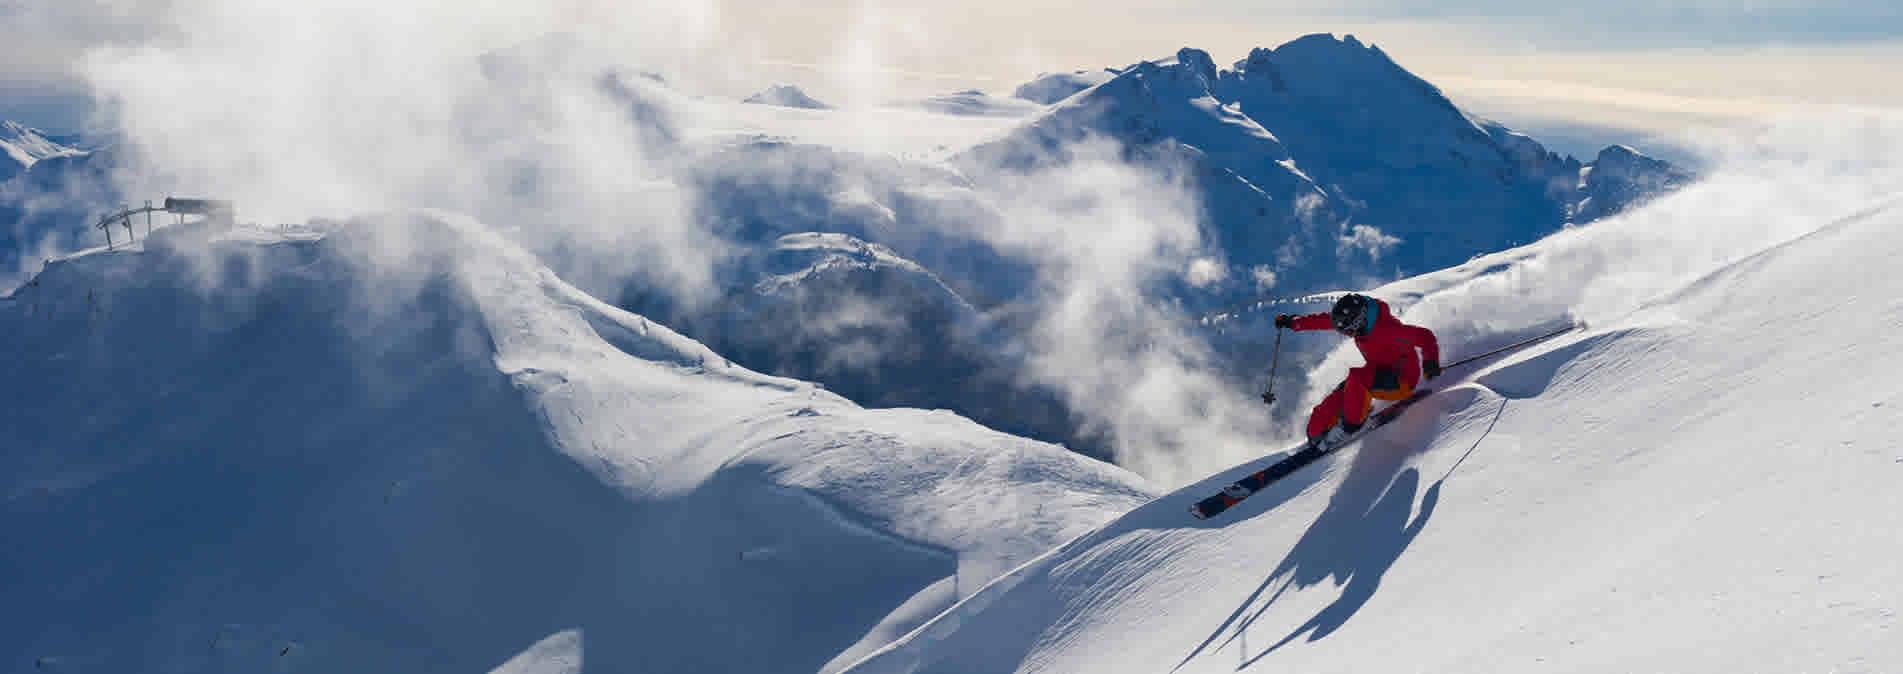 Ski Whistler Blackcomb Canada